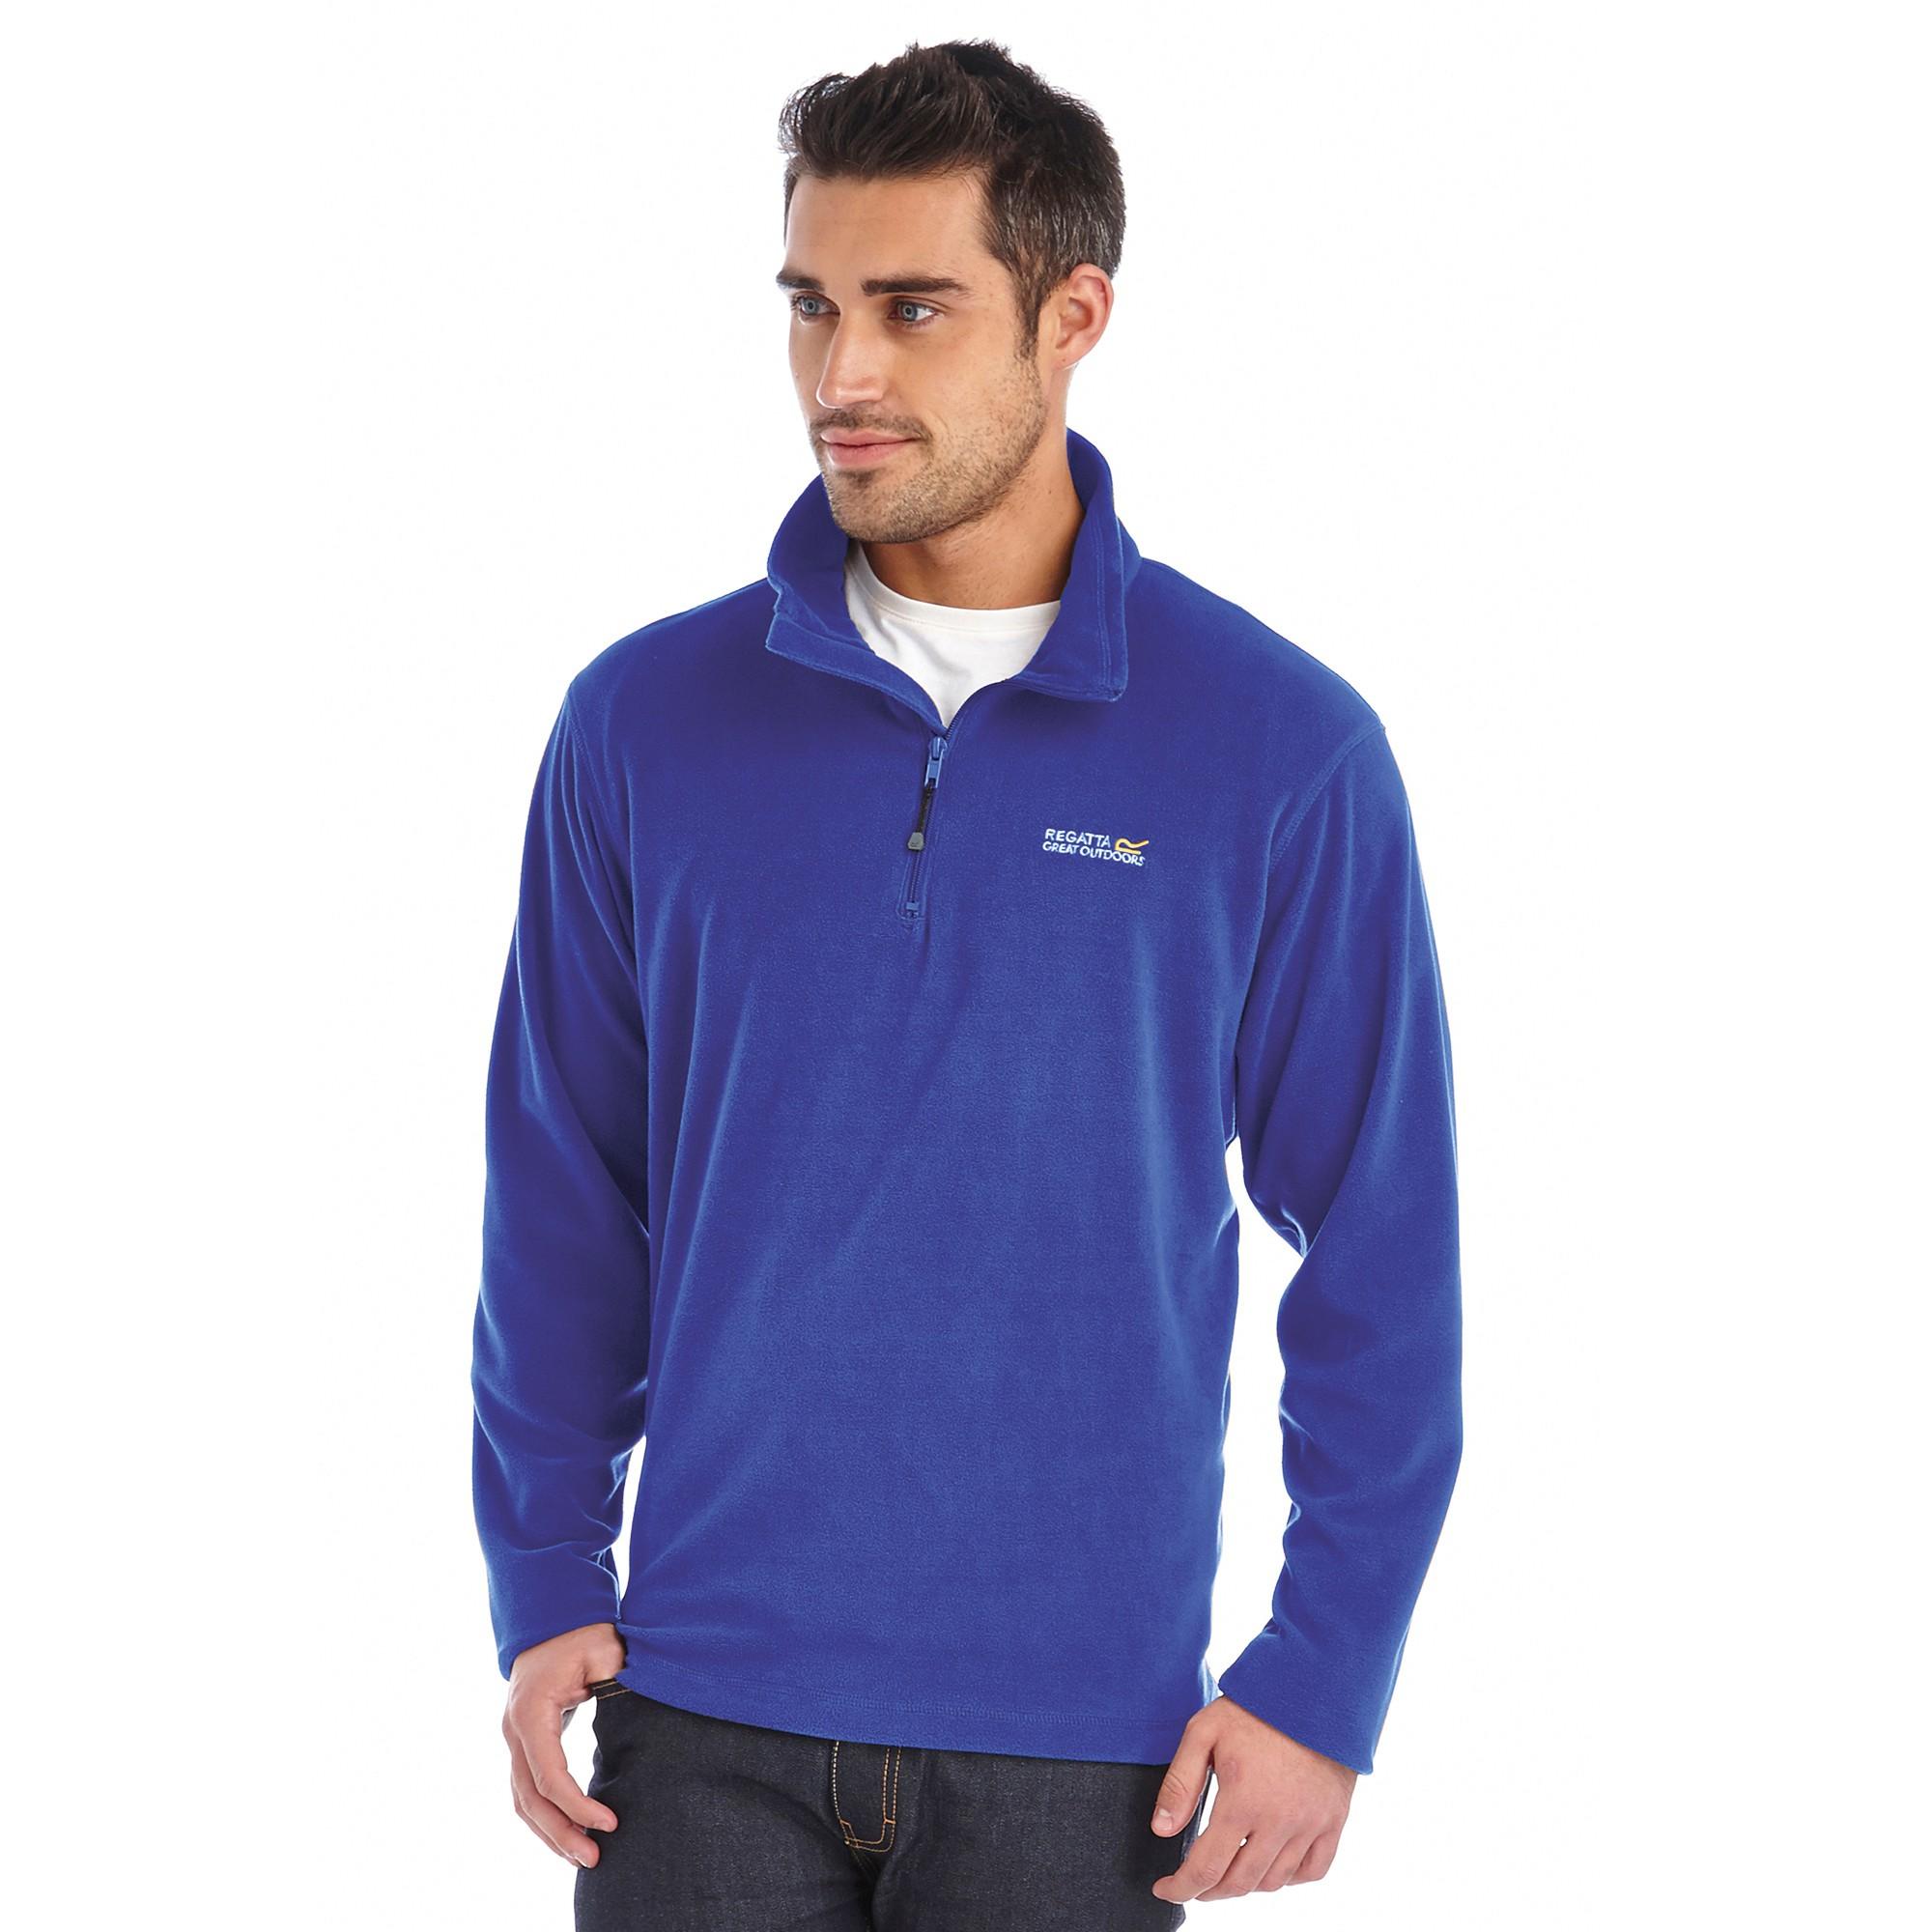 2-x-Regatta-Thompson-Mens-Lightweight-Microfleece-Fleece-Jacket